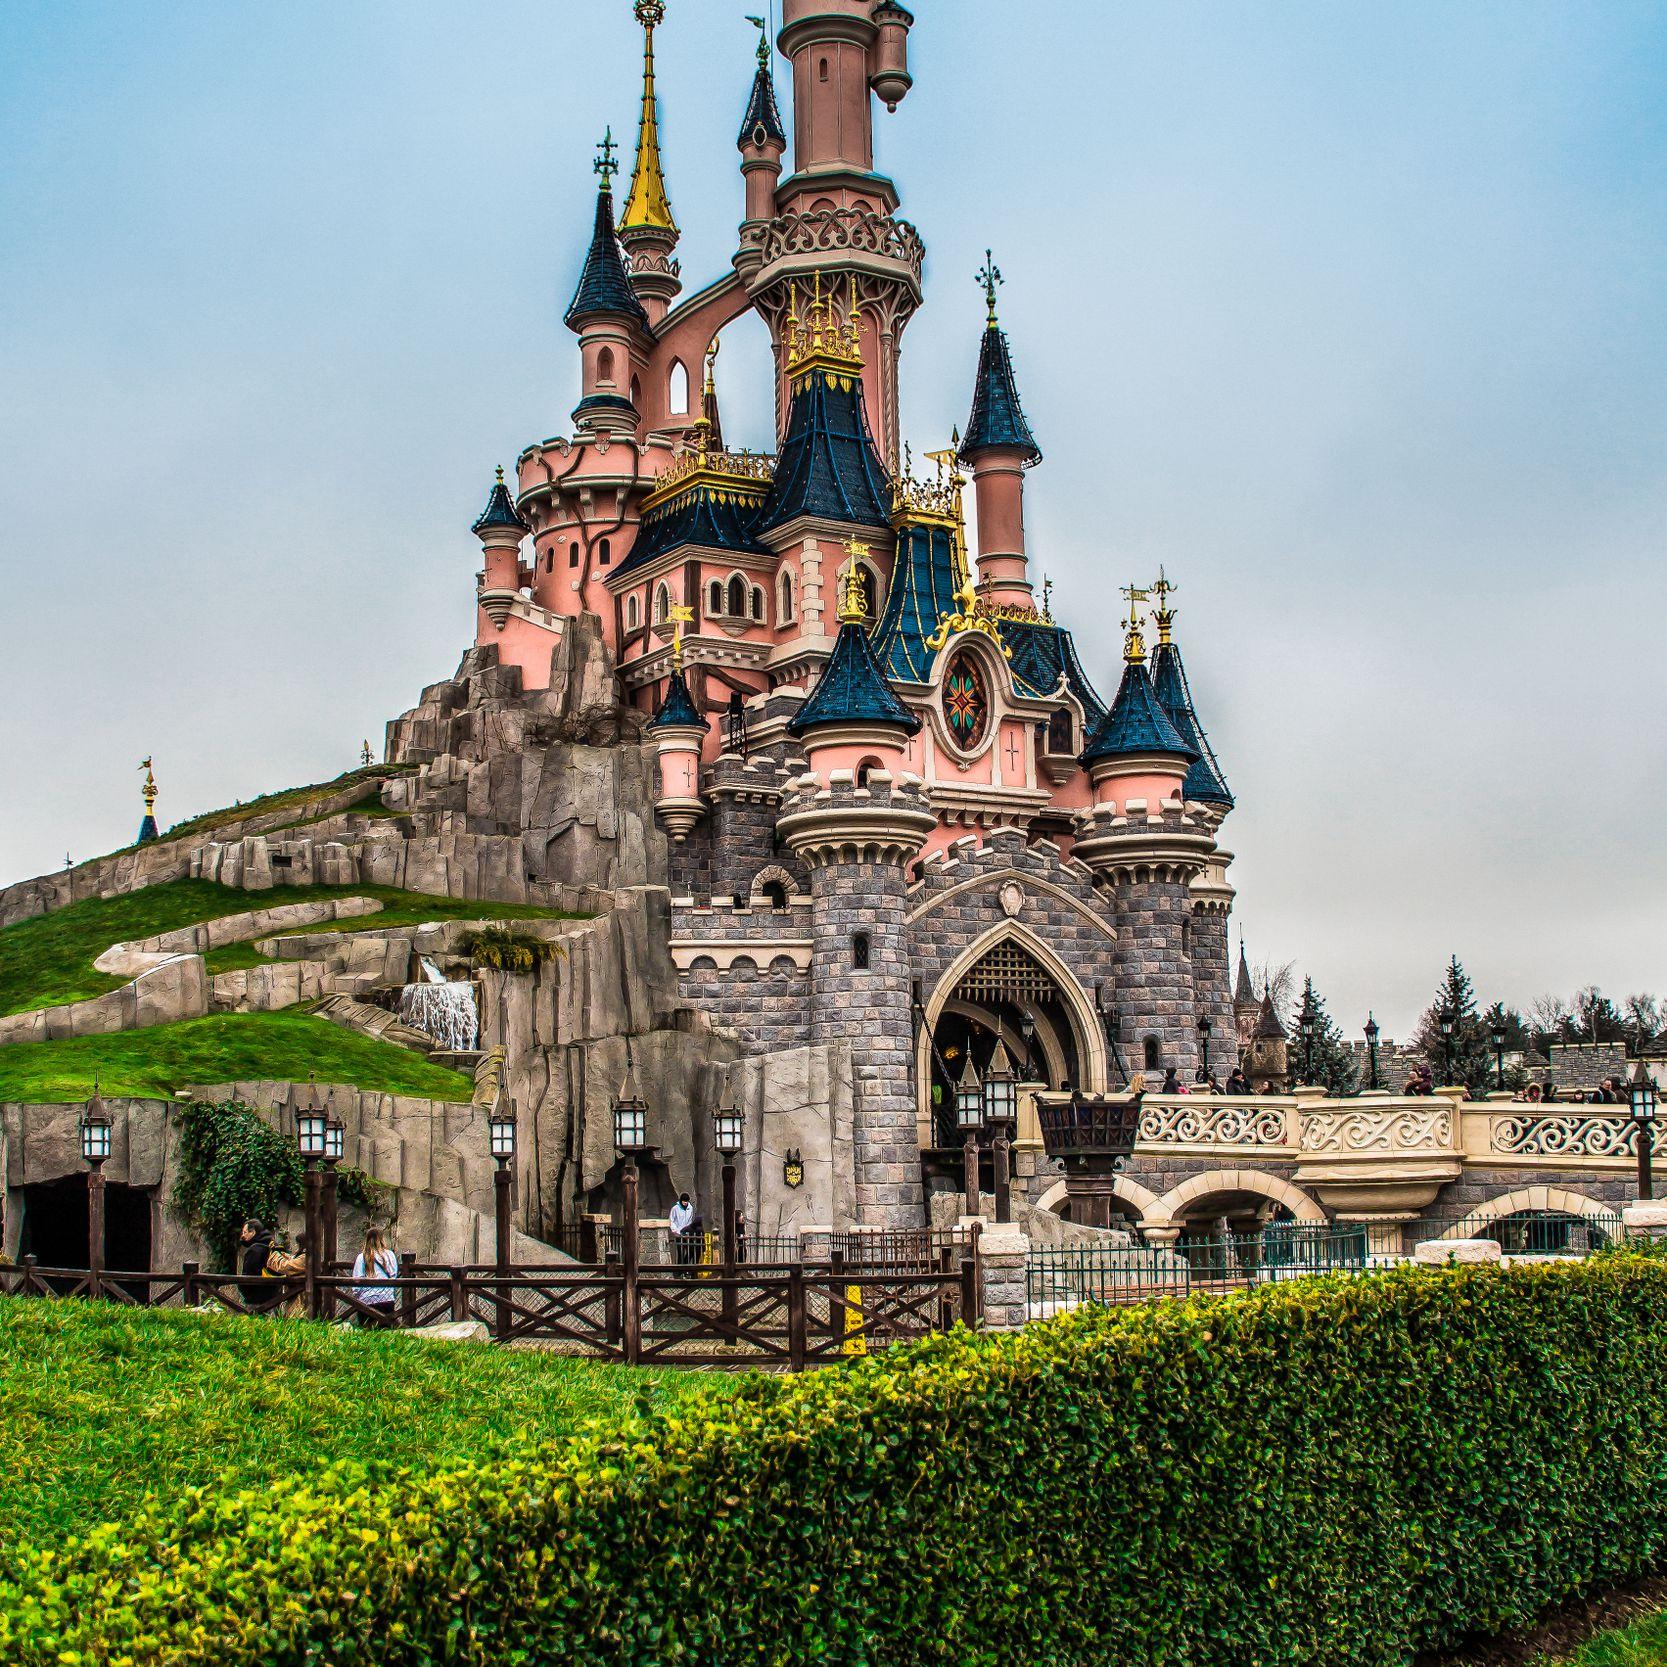 Disneyland Resort near Paris